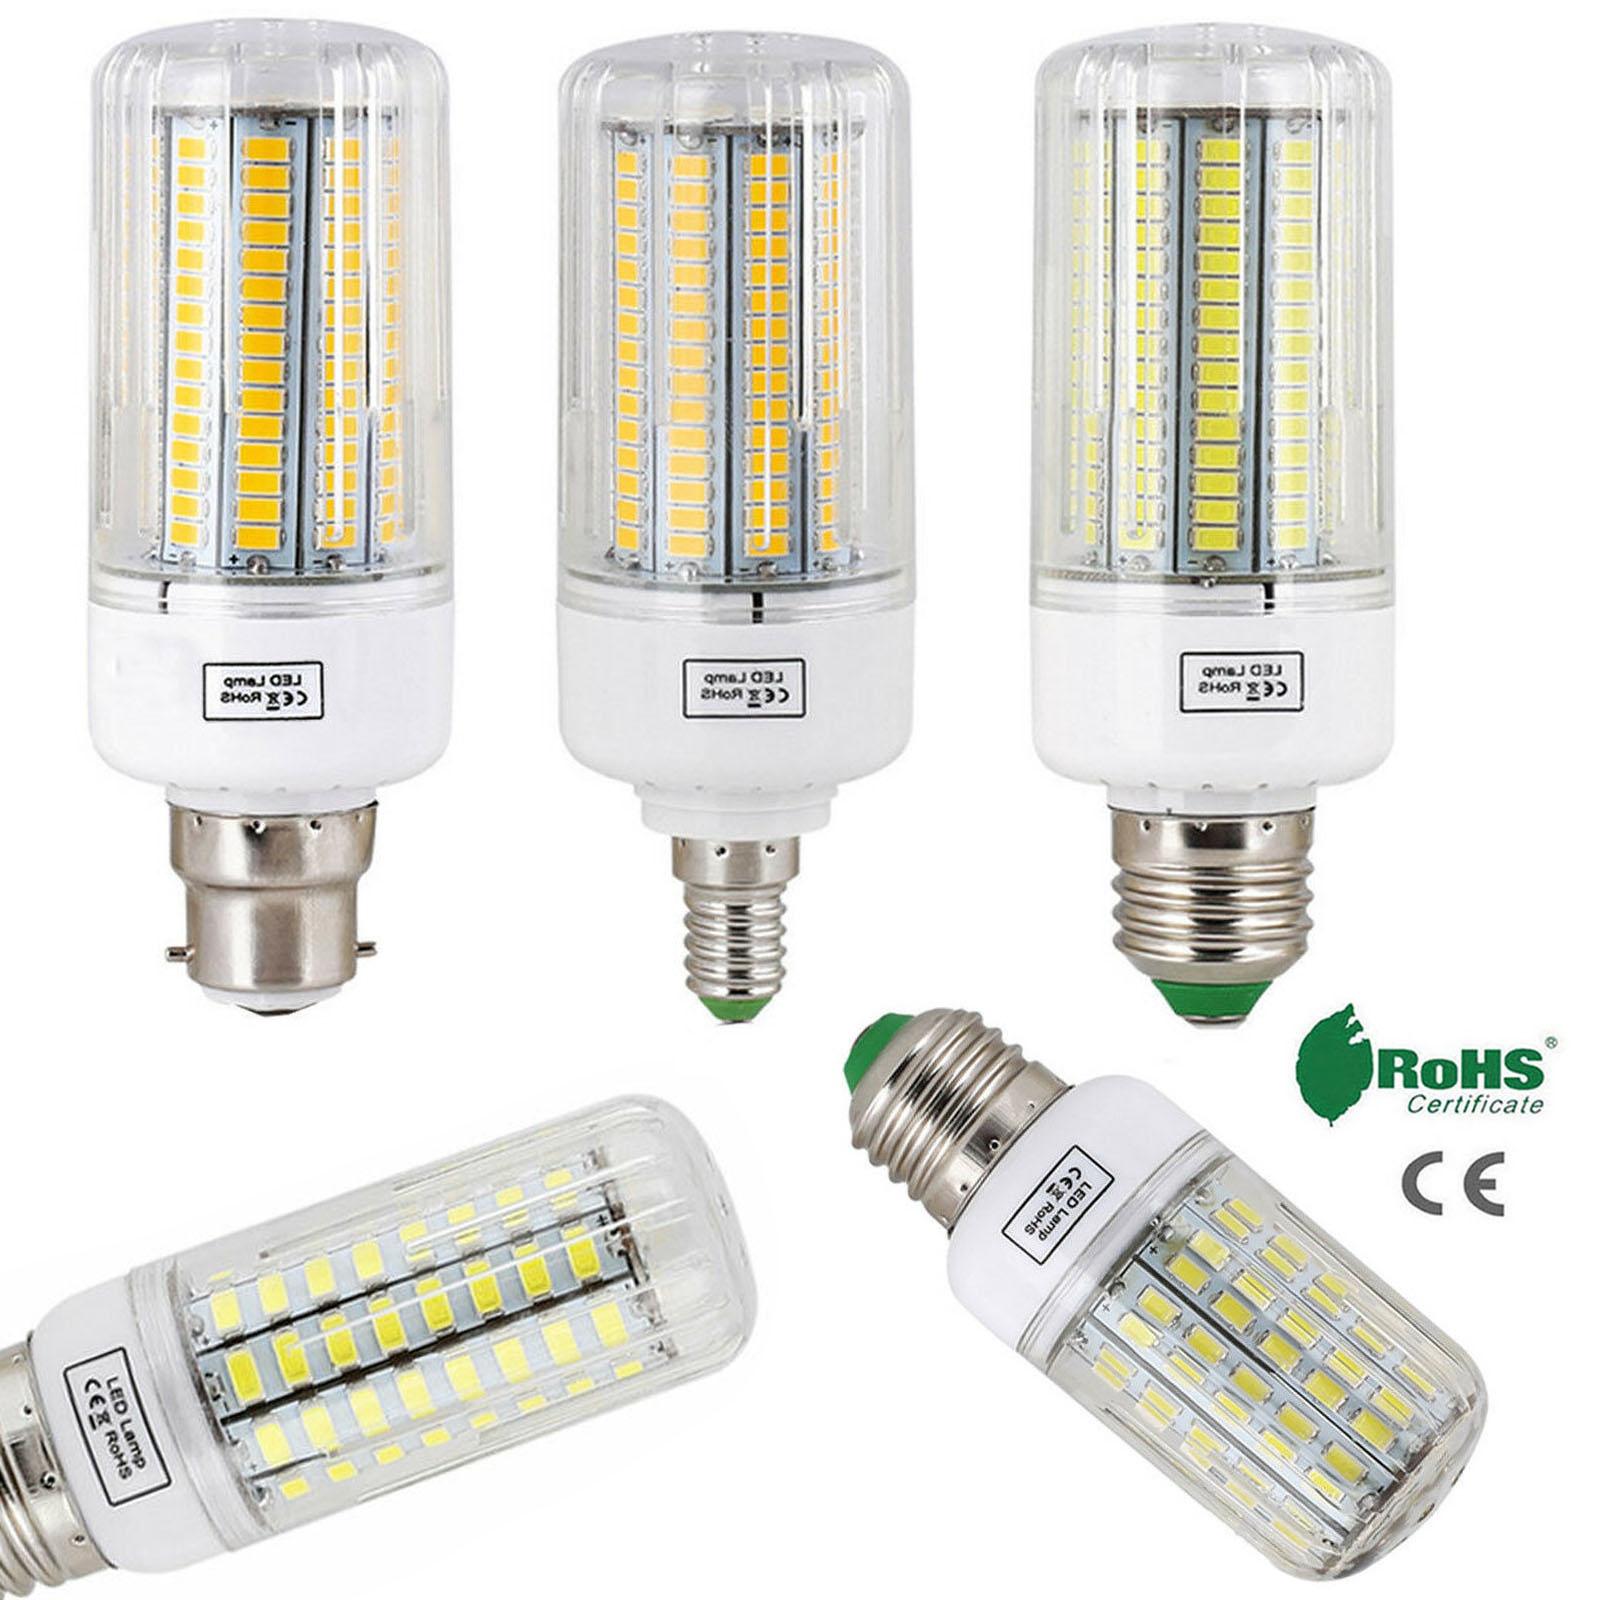 LED Bulbs E27 Corn Light B22 E14 5730 SMD 24LEDs - 165LEDs 110V 220V Chandelier Candle LED Light For Home Decoration Ampoule YZ